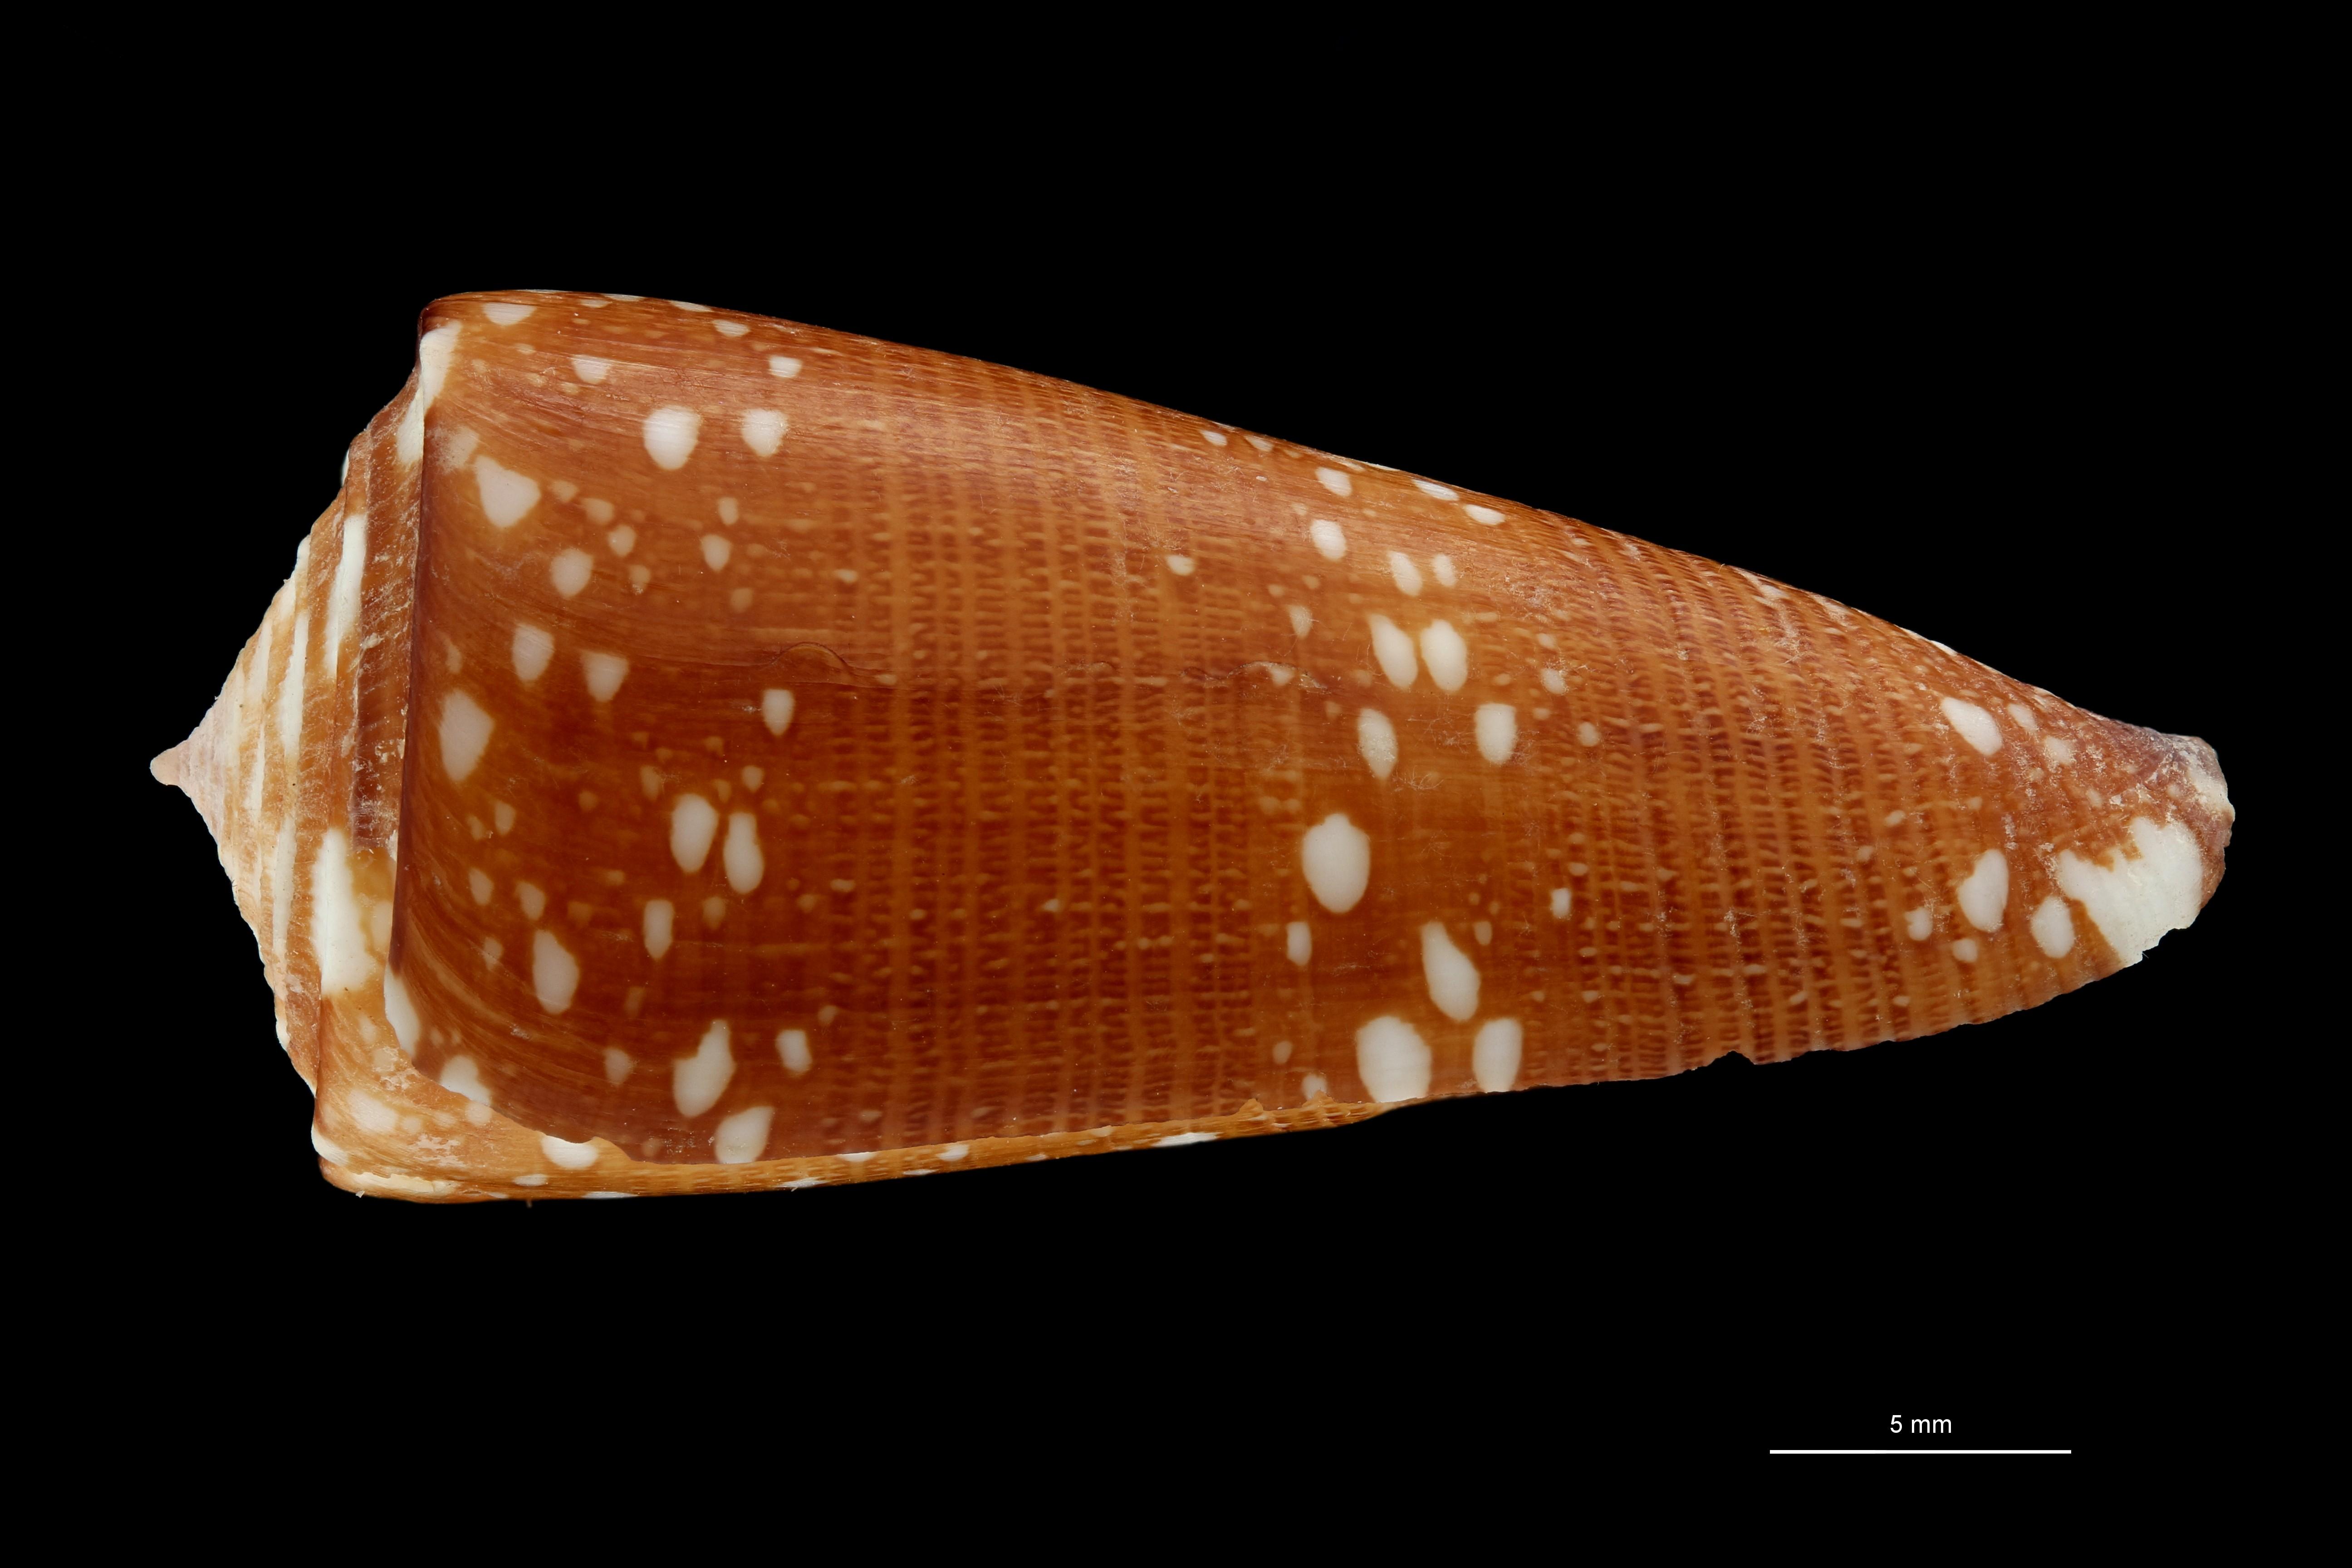 BE-RBINS-INV MT.2599 Conus nobilis abbai Ht L ZS PMax Scaled.jpg